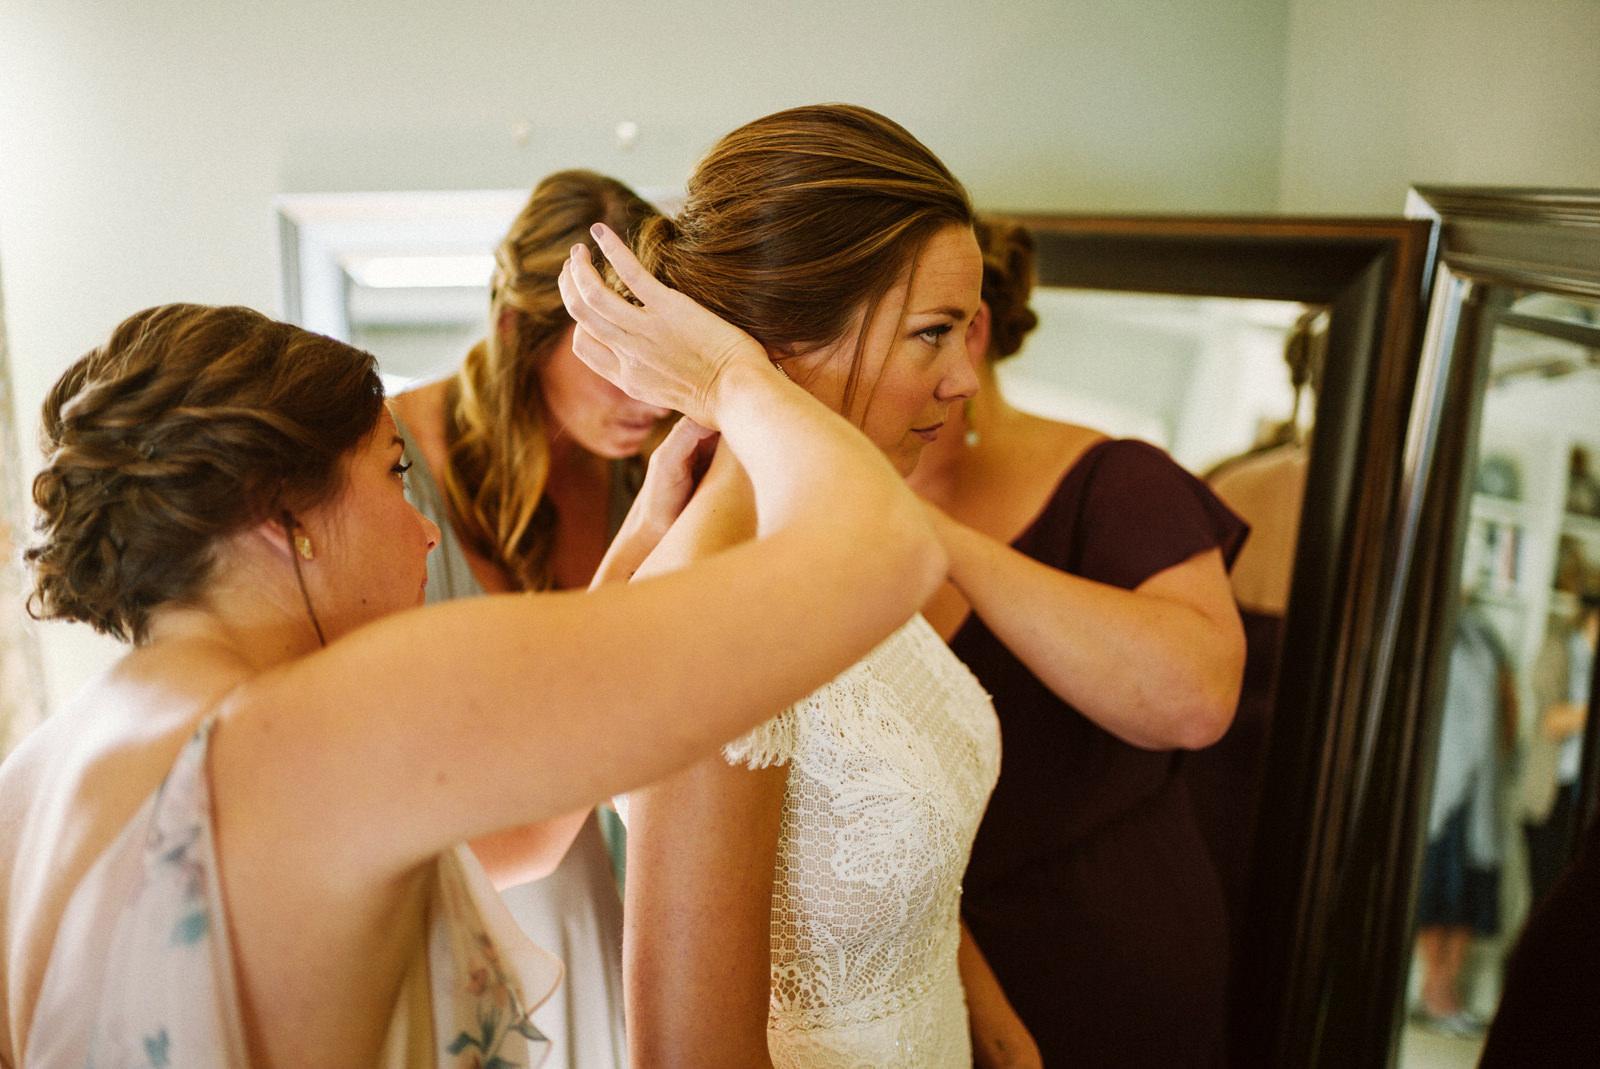 bridgeport-wedding-029 BRIDGEPORT, CONNECTICUT BACKYARD WEDDING